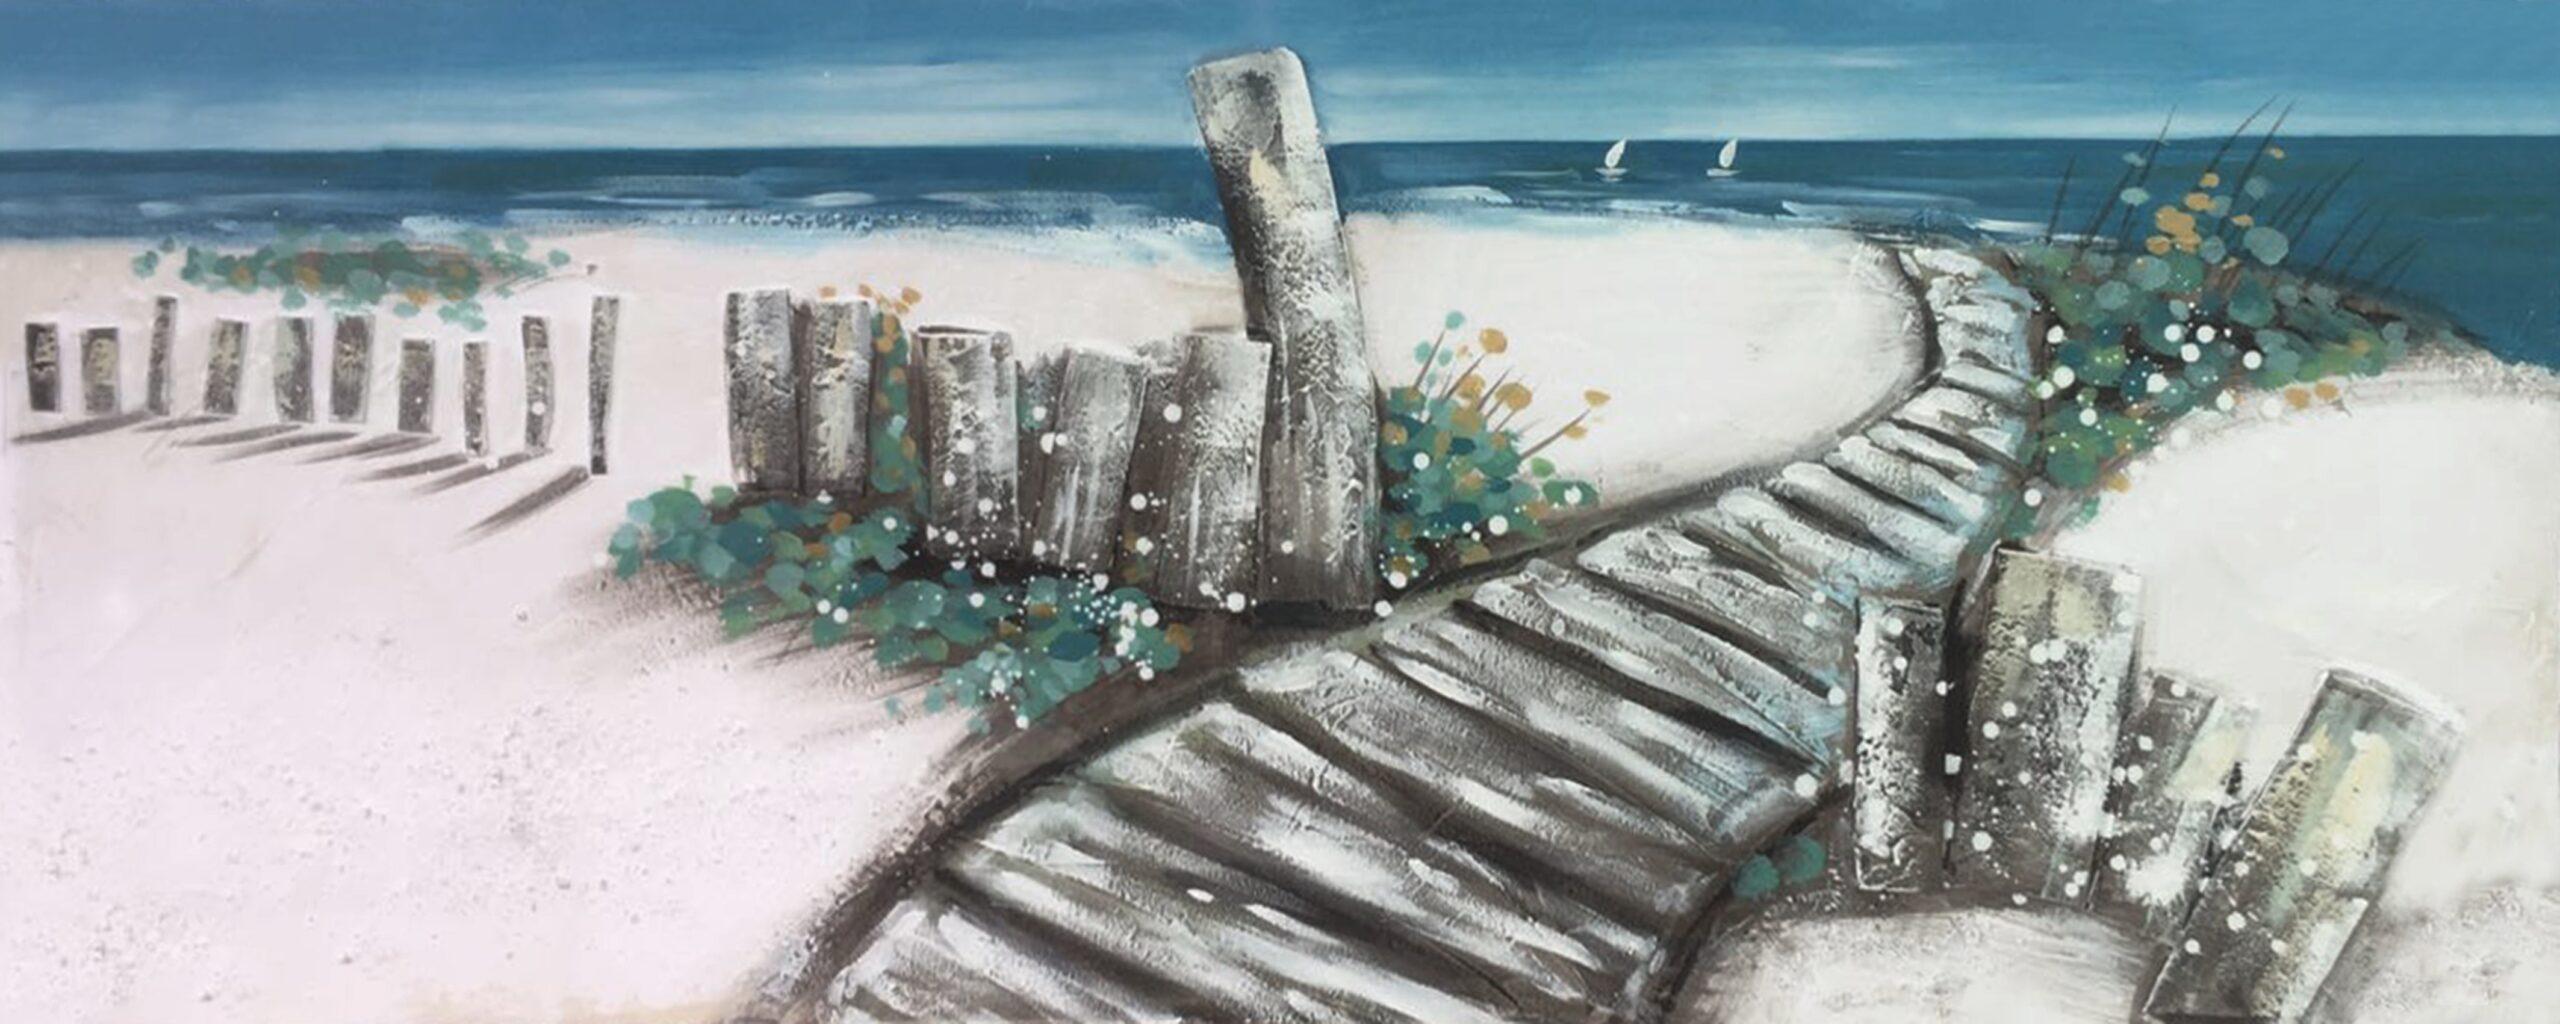 Schilderij Beach Wooden Walkway Looppad Strand GS-P0543